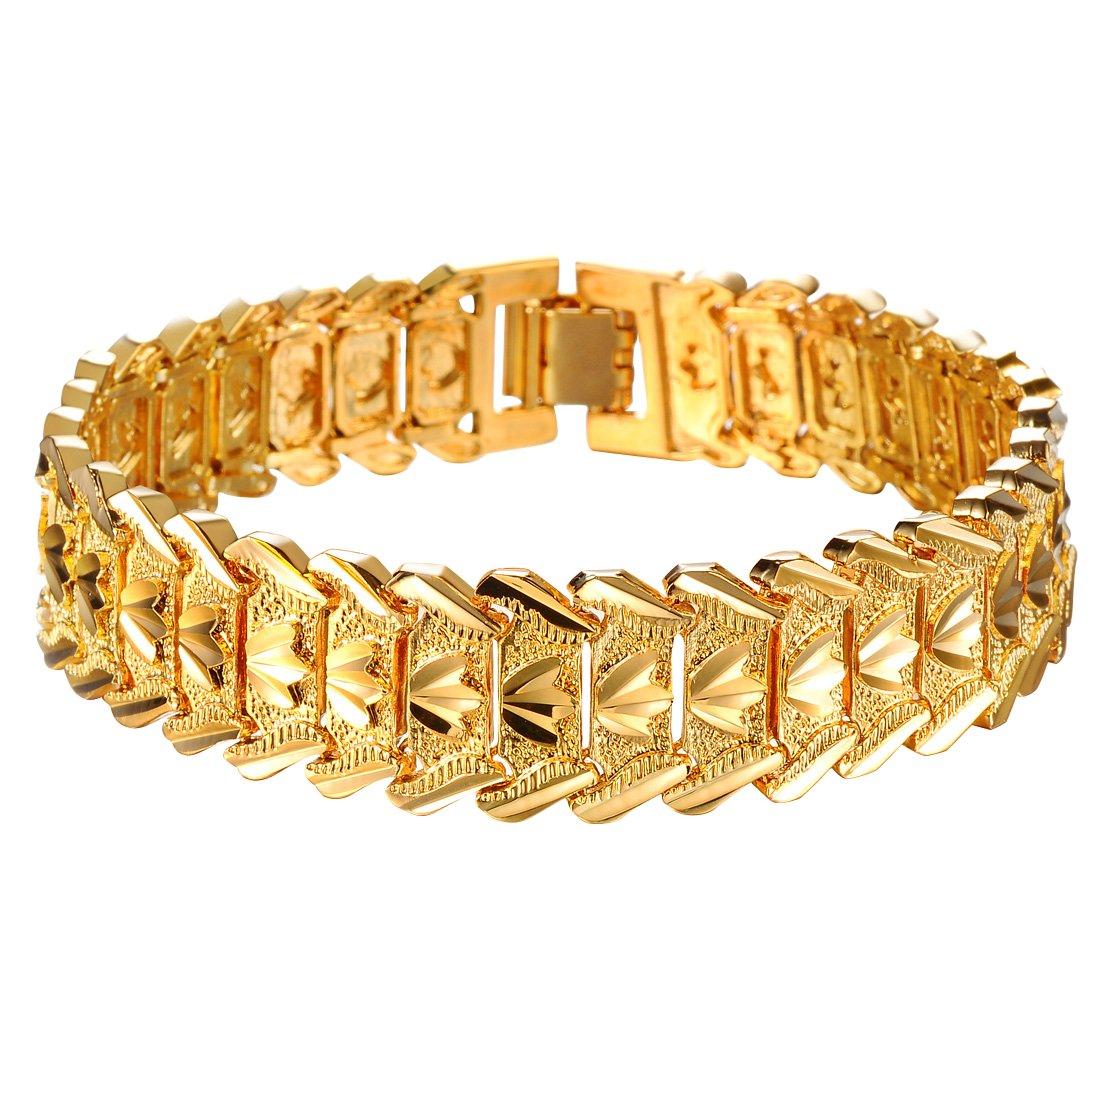 a074c062c1d5c OPK Jewellry Men s 18K Gold Plated Bracelet Bangle Cool Chain Link Crown  Wristband Wedding Gift 210mm  OPK  Amazon.co.uk  Jewellery